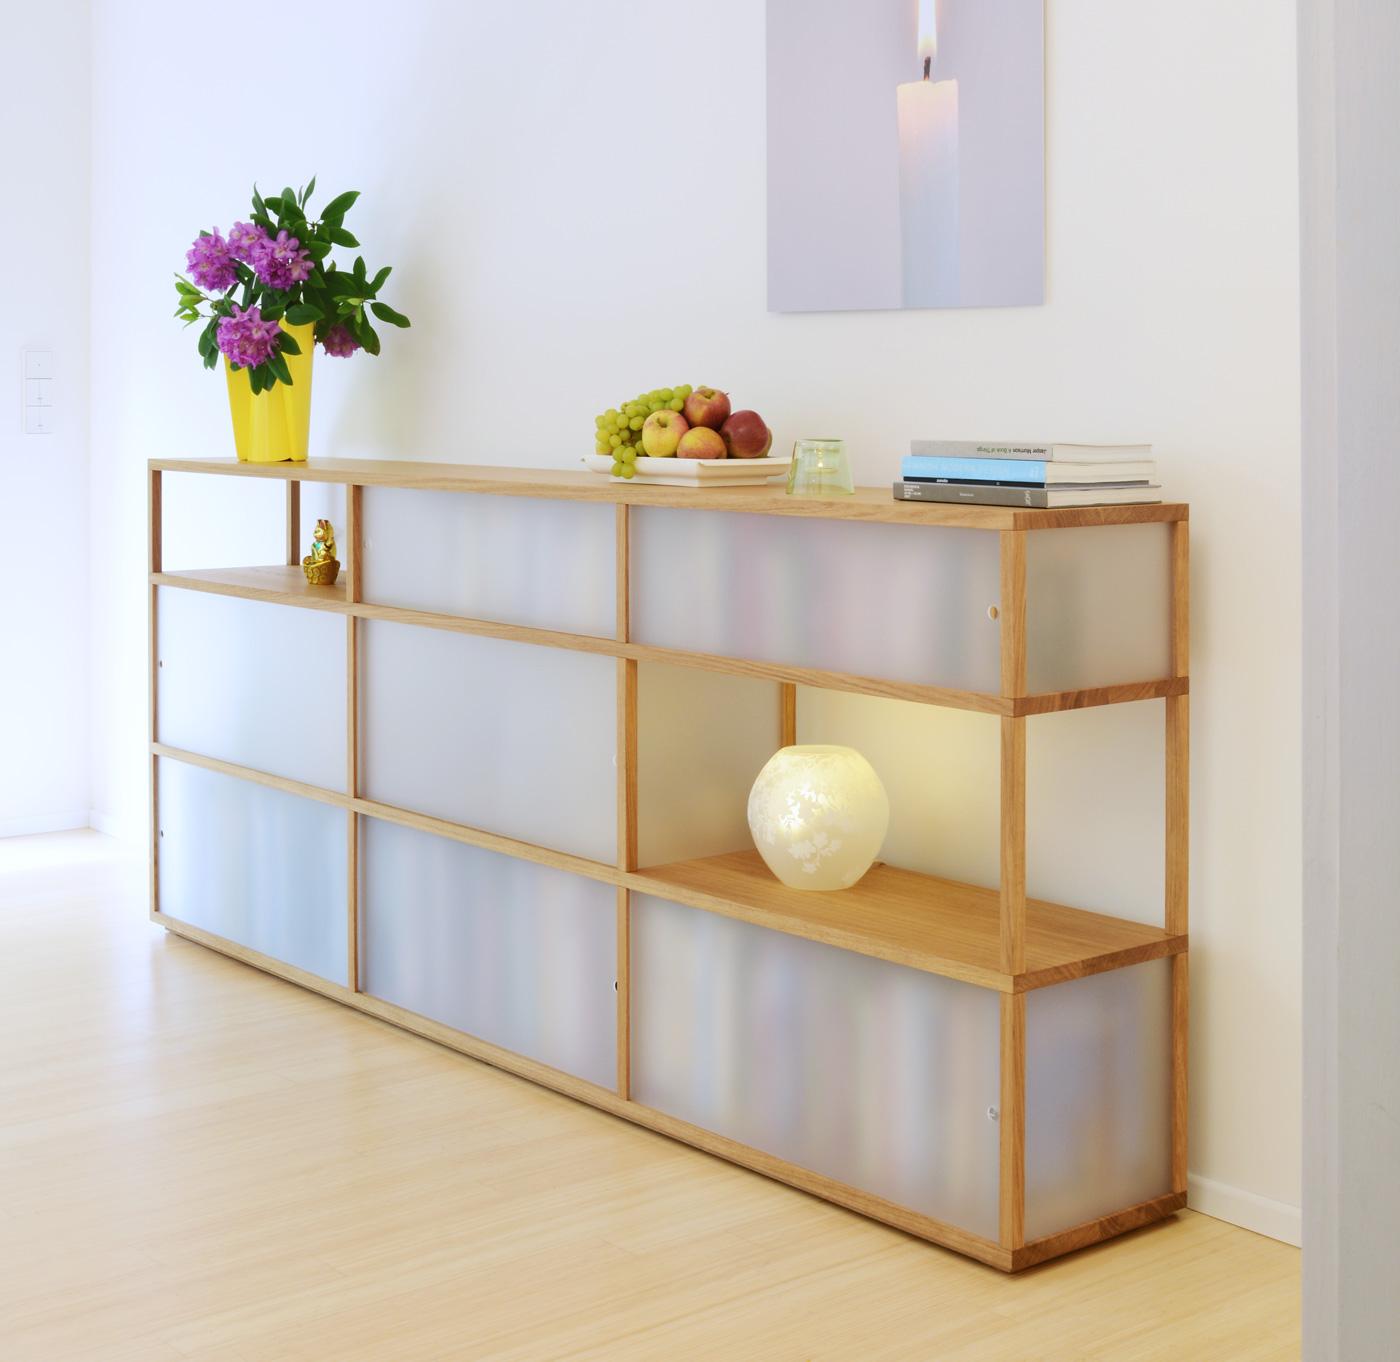 Eduard Euwens Staubfrei Dust Free Display Cabinets